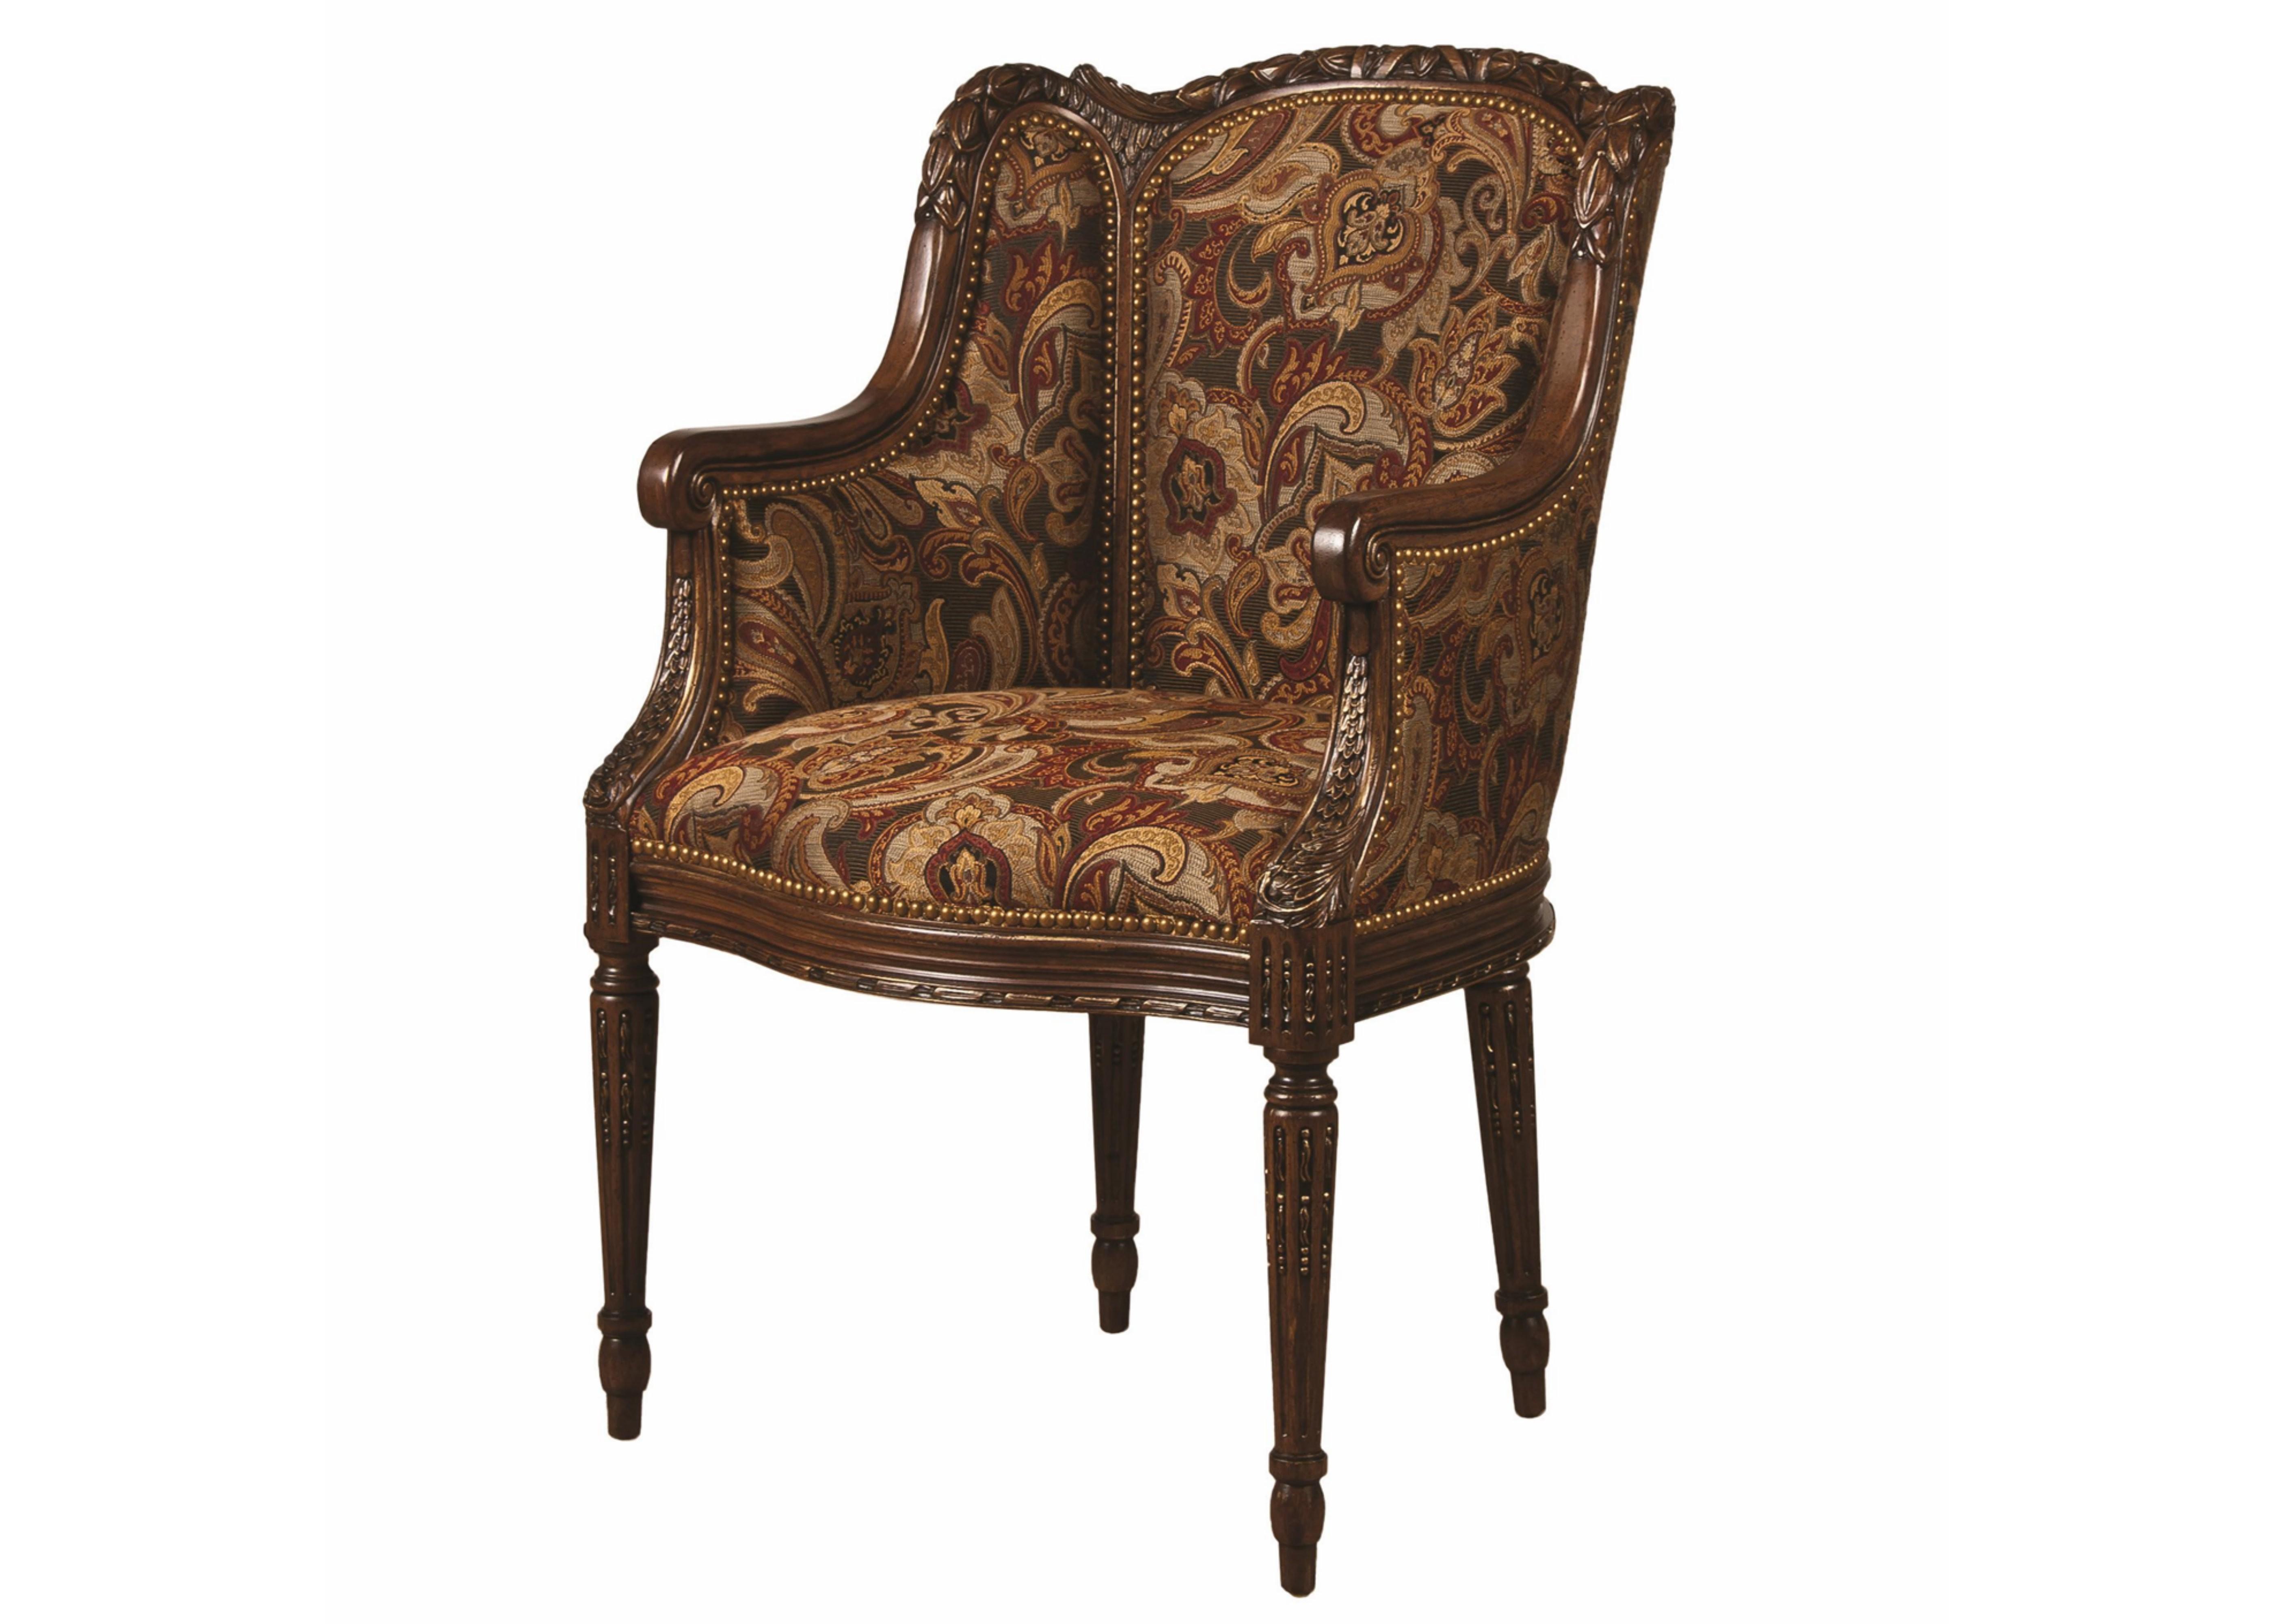 КреслоИнтерьерные кресла<br><br><br>Material: Текстиль<br>Width см: 66<br>Depth см: 64<br>Height см: 99